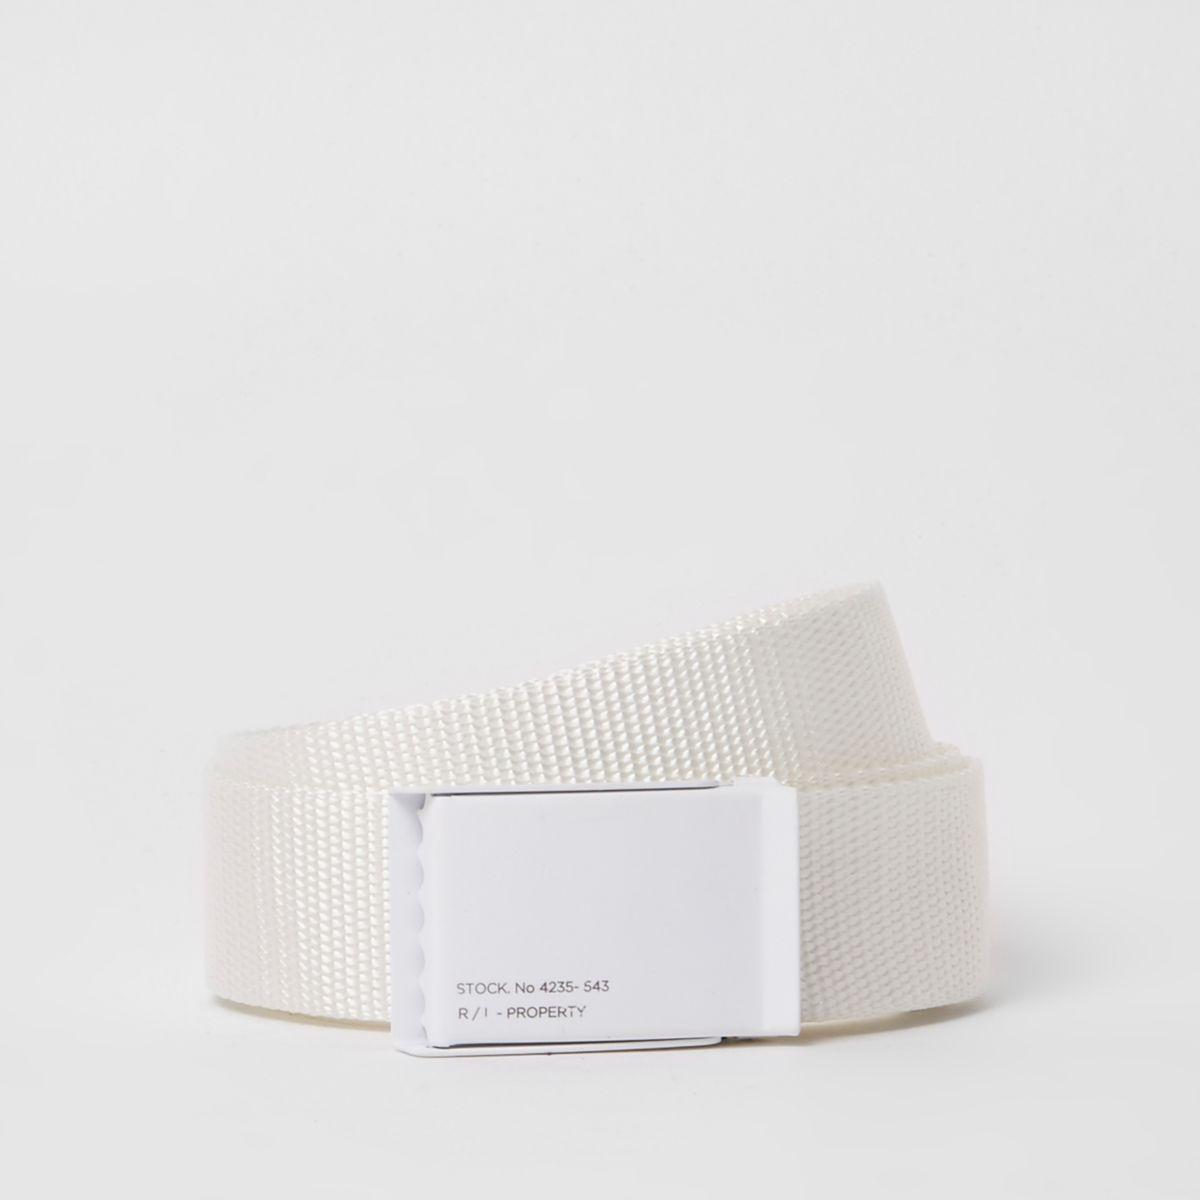 White textured plate buckle belt